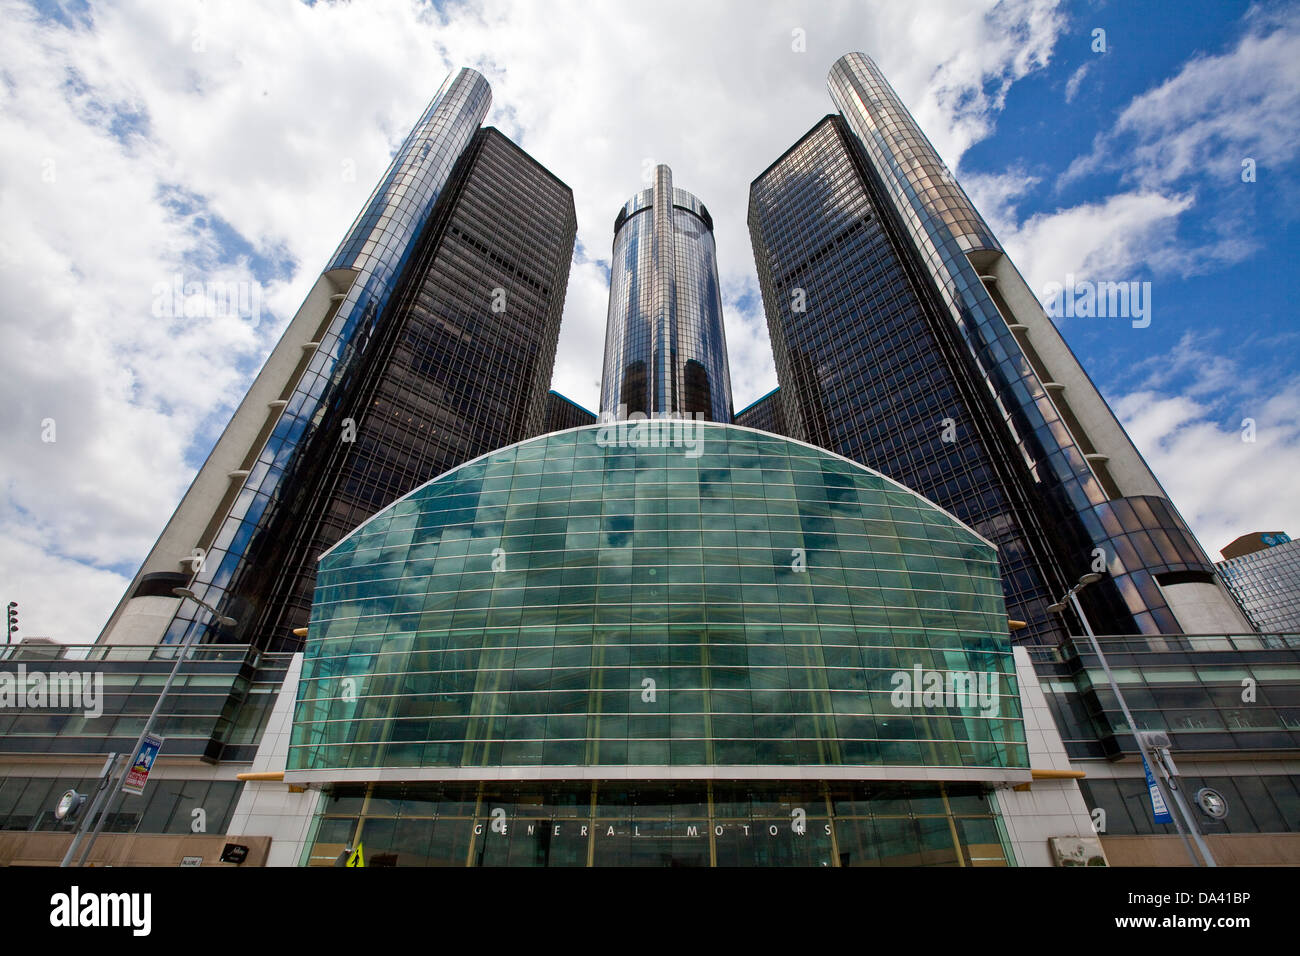 General Motors corporate headquarters is seen in Detroit Renaissance Center - Stock Image